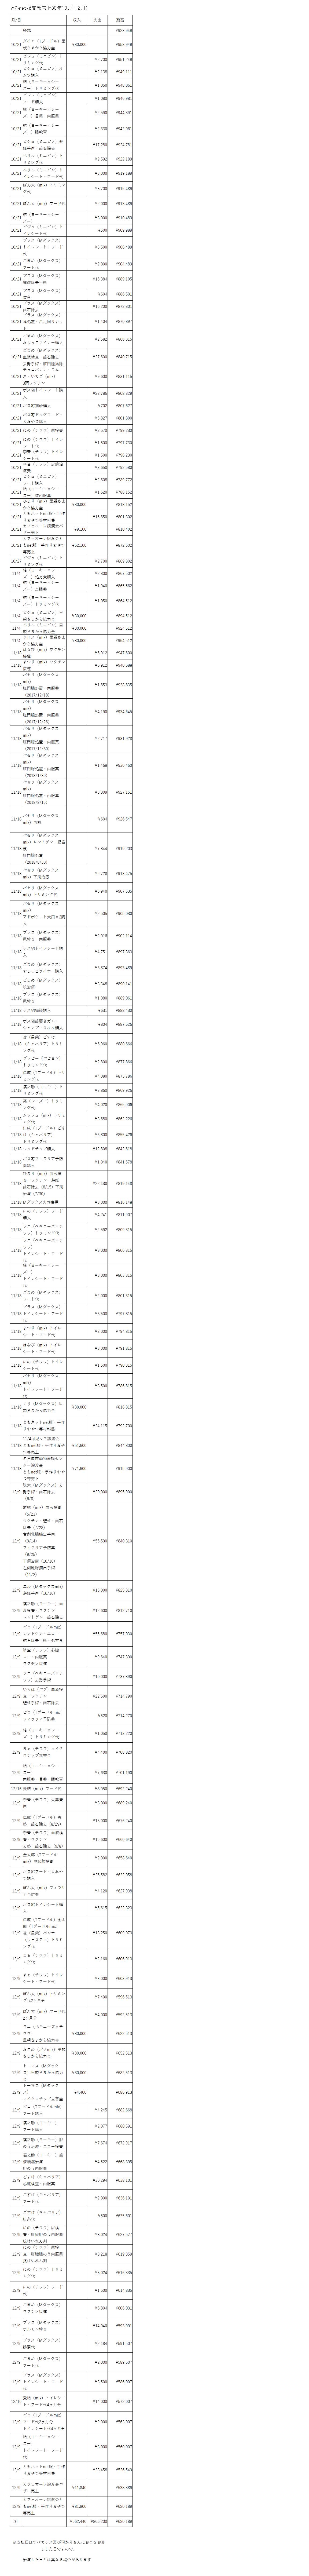 10-12収支報告